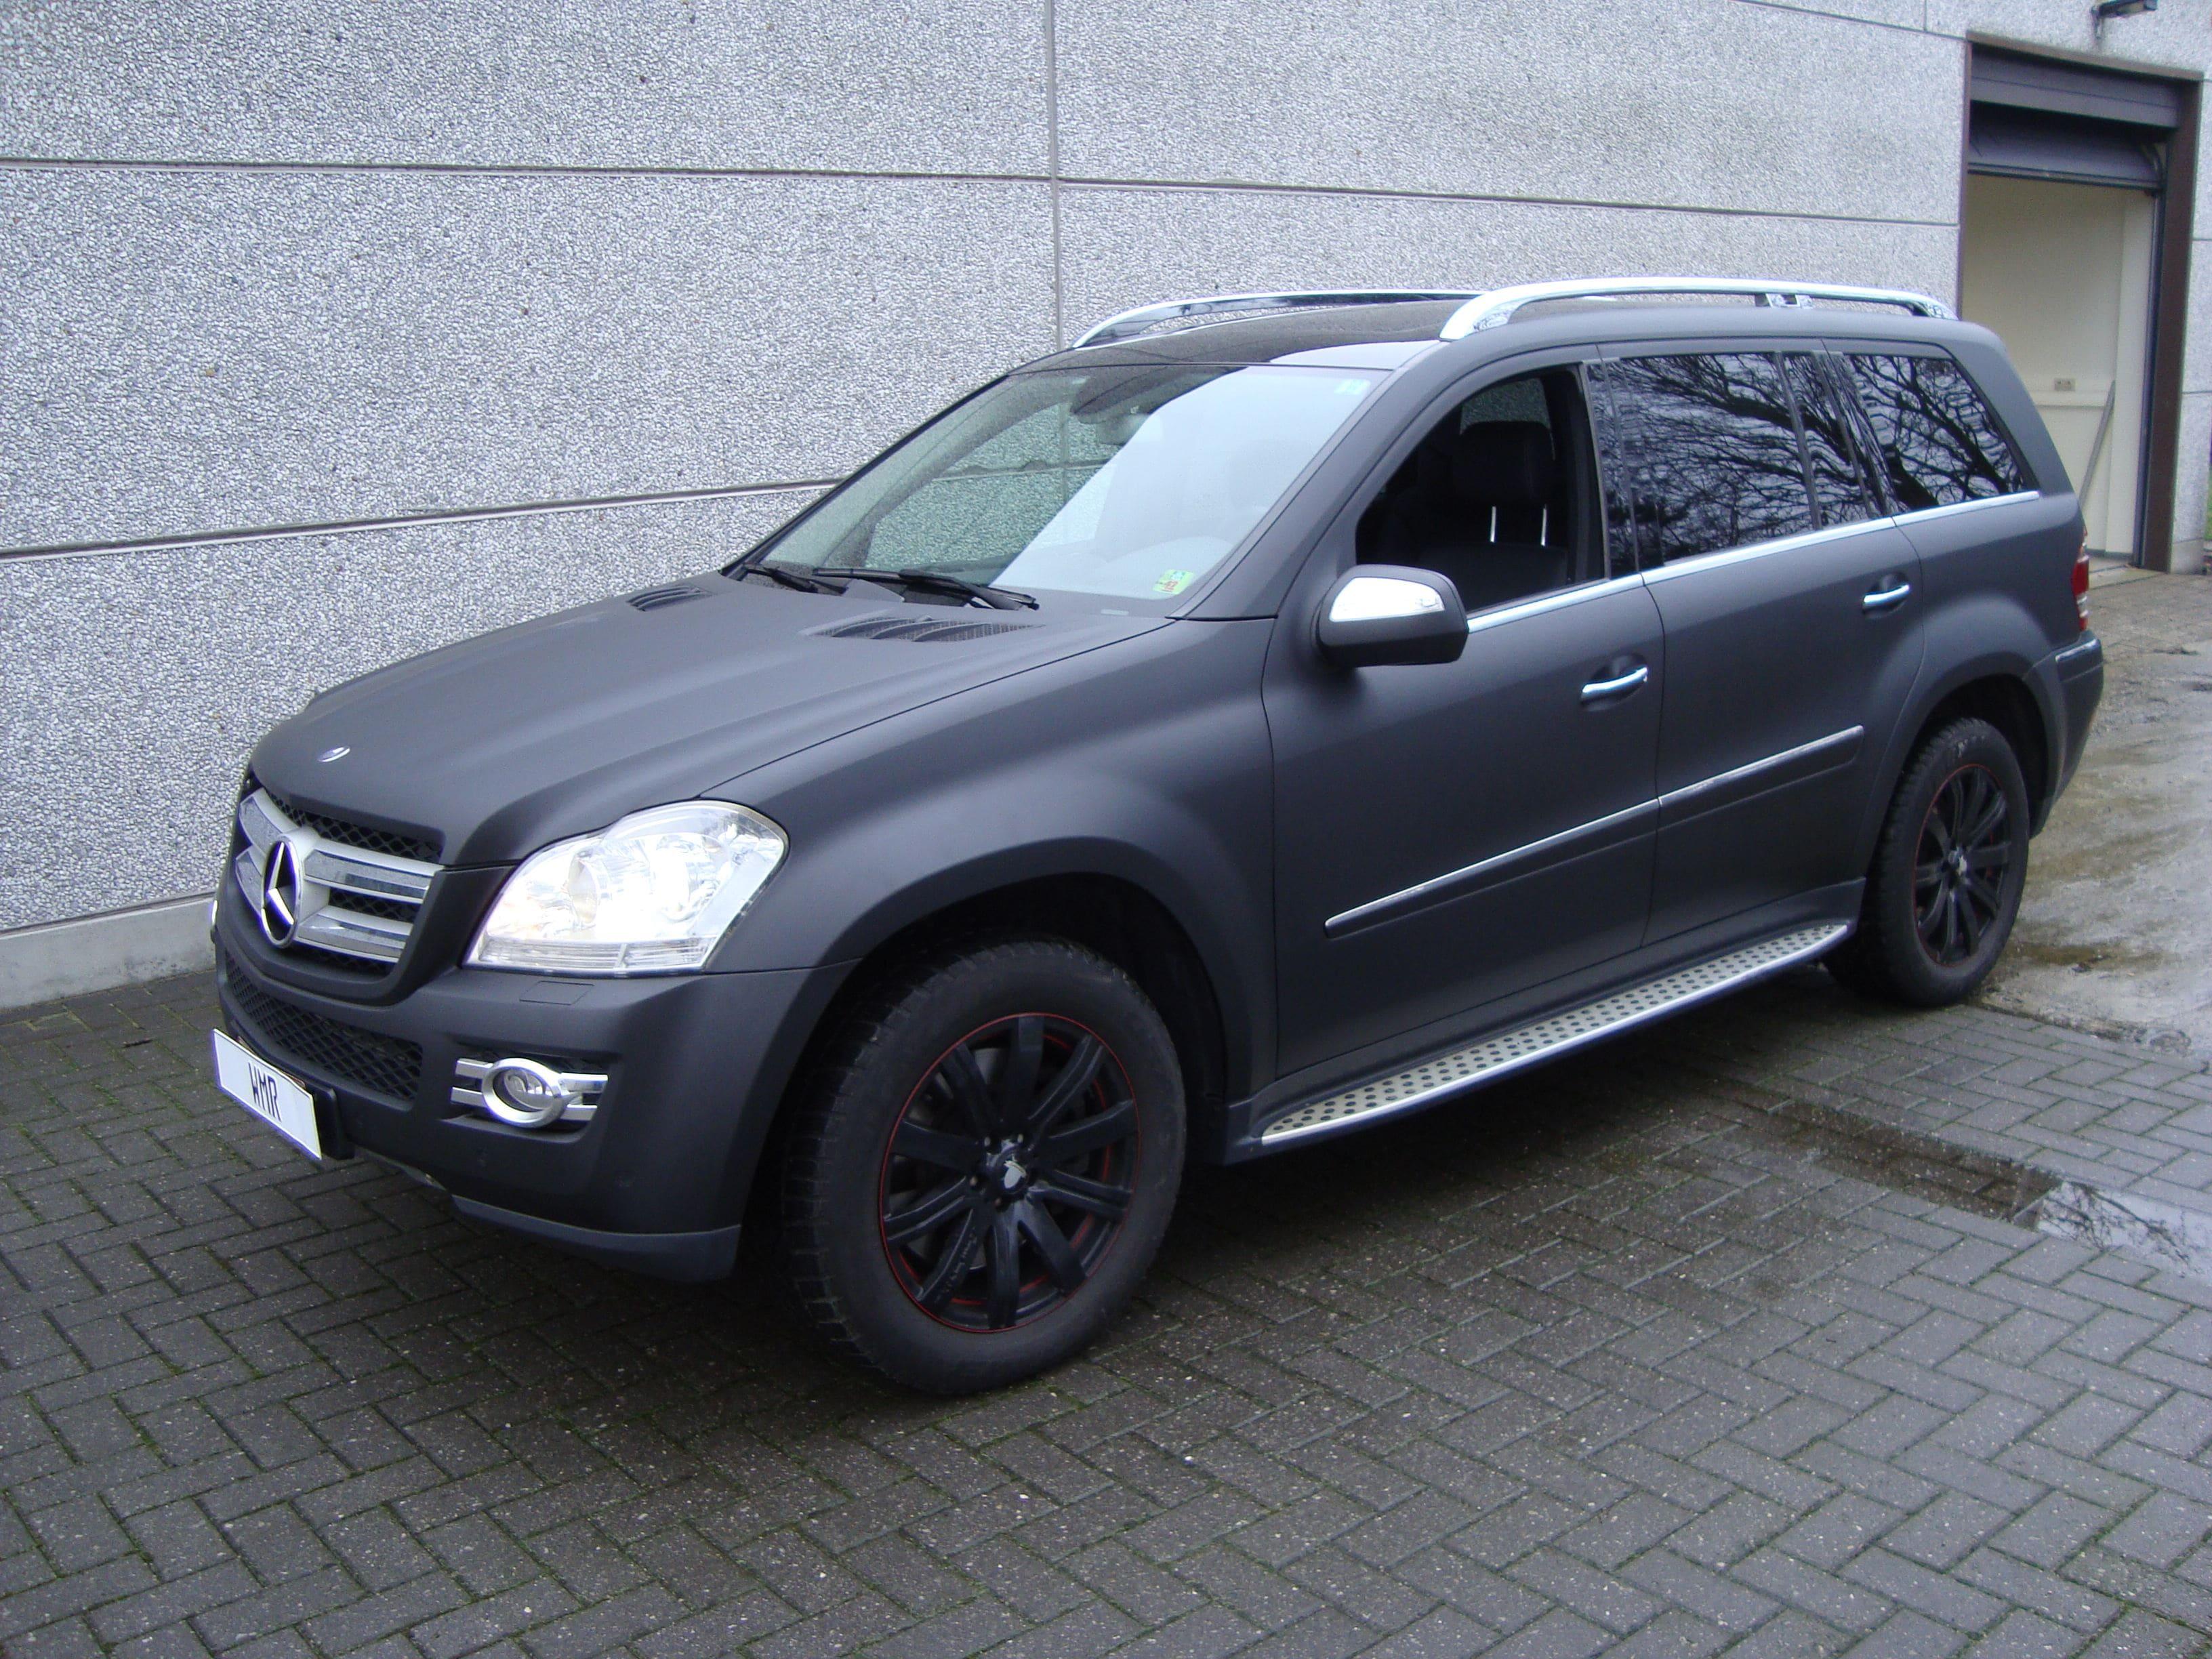 Mercedes GL met Mat Zwarte Wrap, Carwrapping door Wrapmyride.nu Foto-nr:6278, ©2020